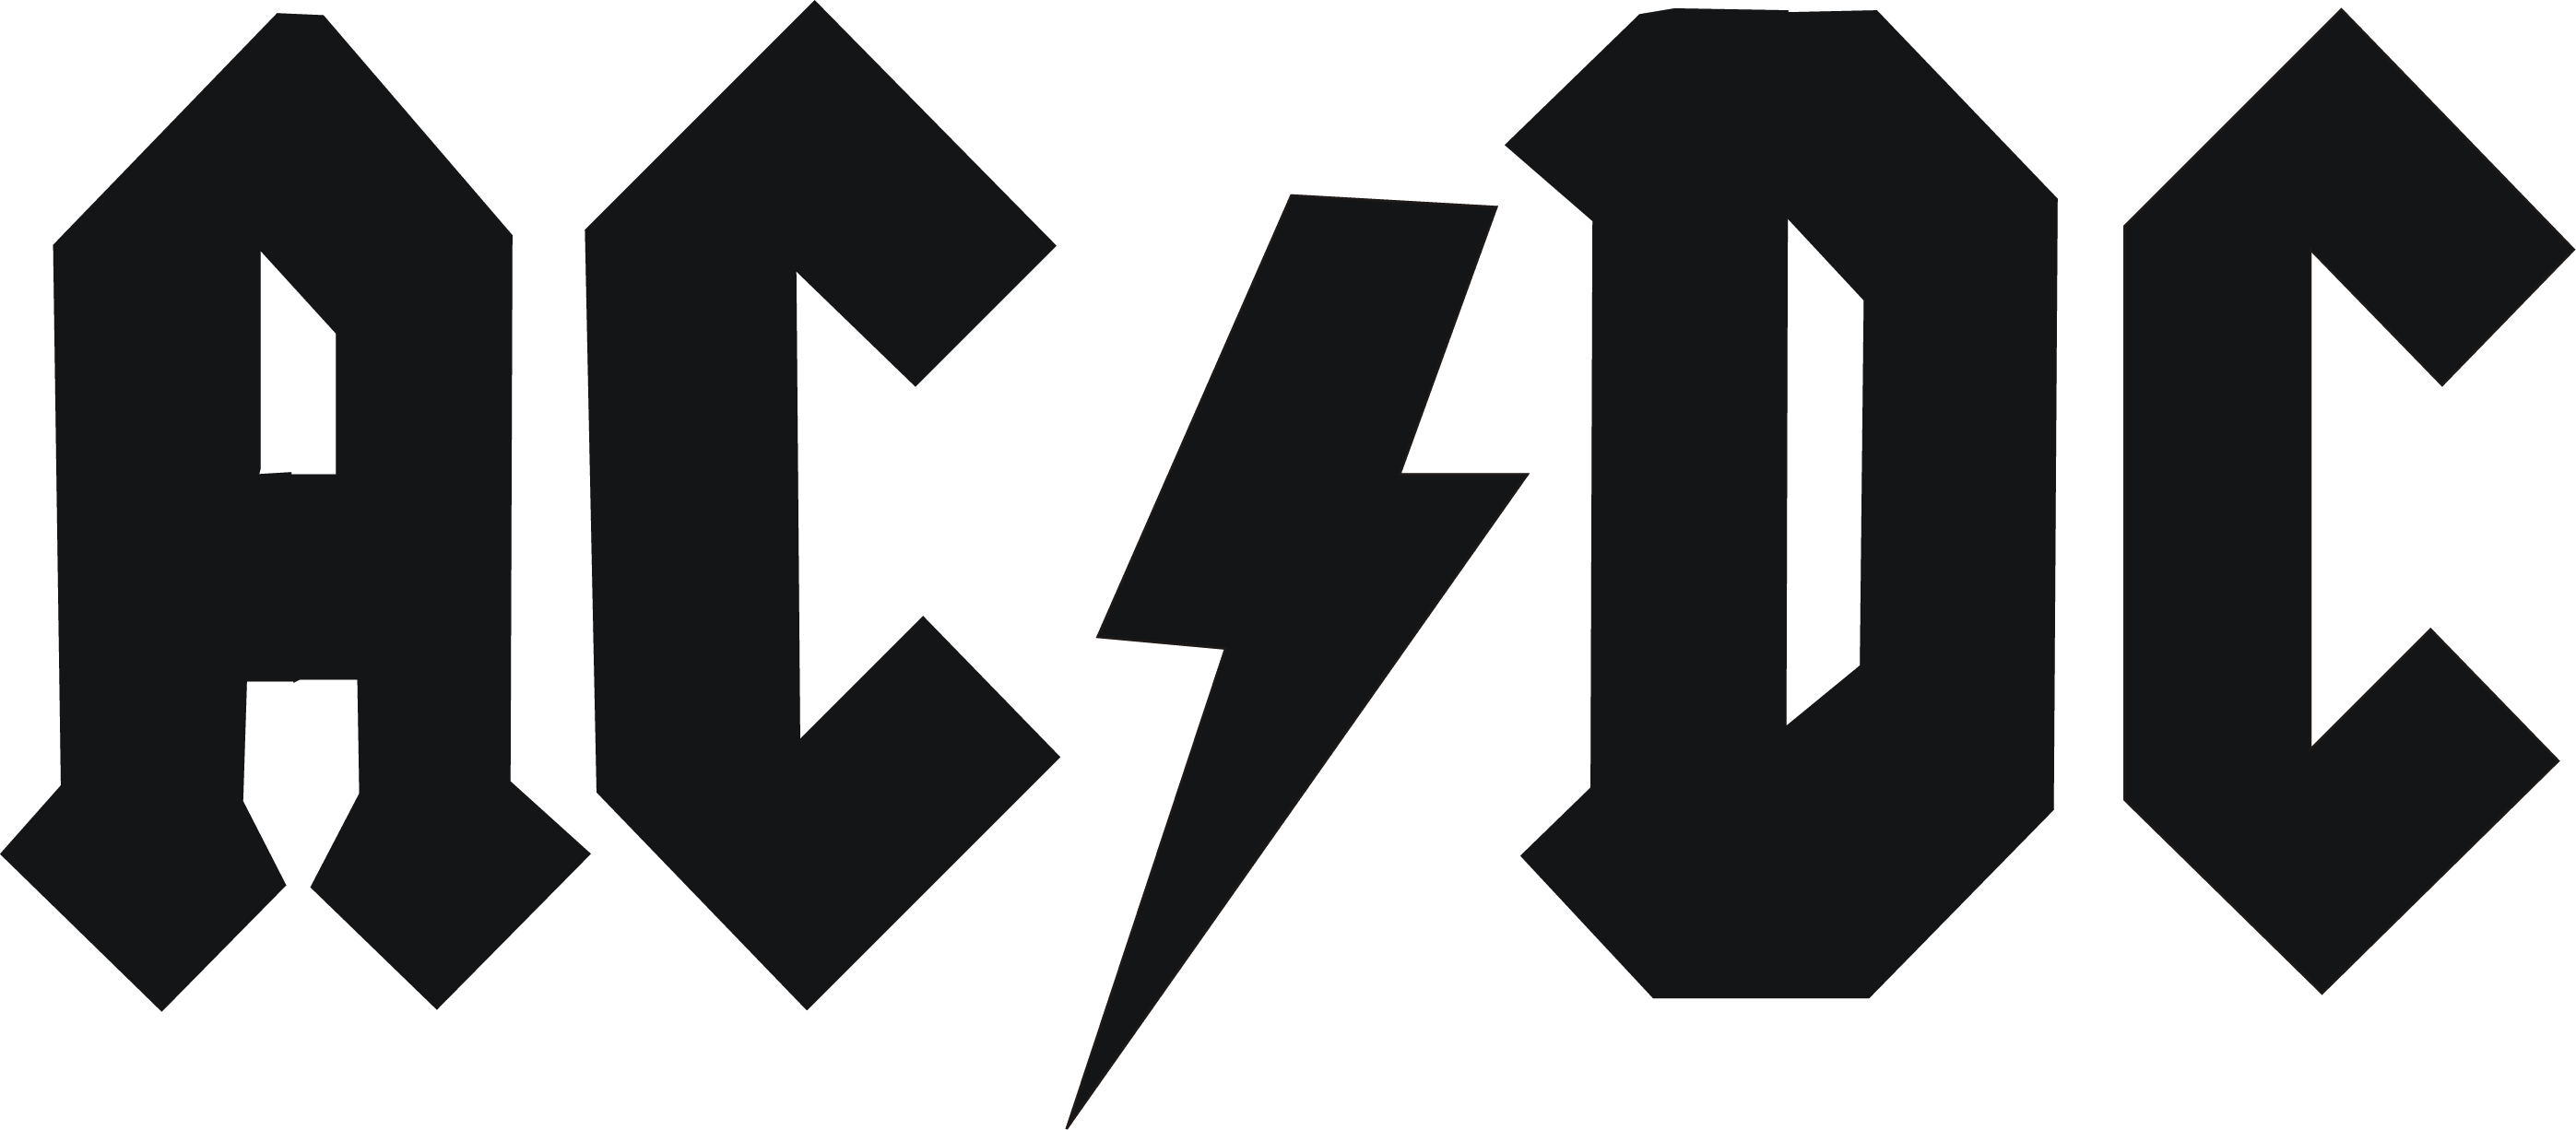 AC/DC Band Logo [EPS File] Vector EPS Free Download, Logo, Icons, Brand Emblems